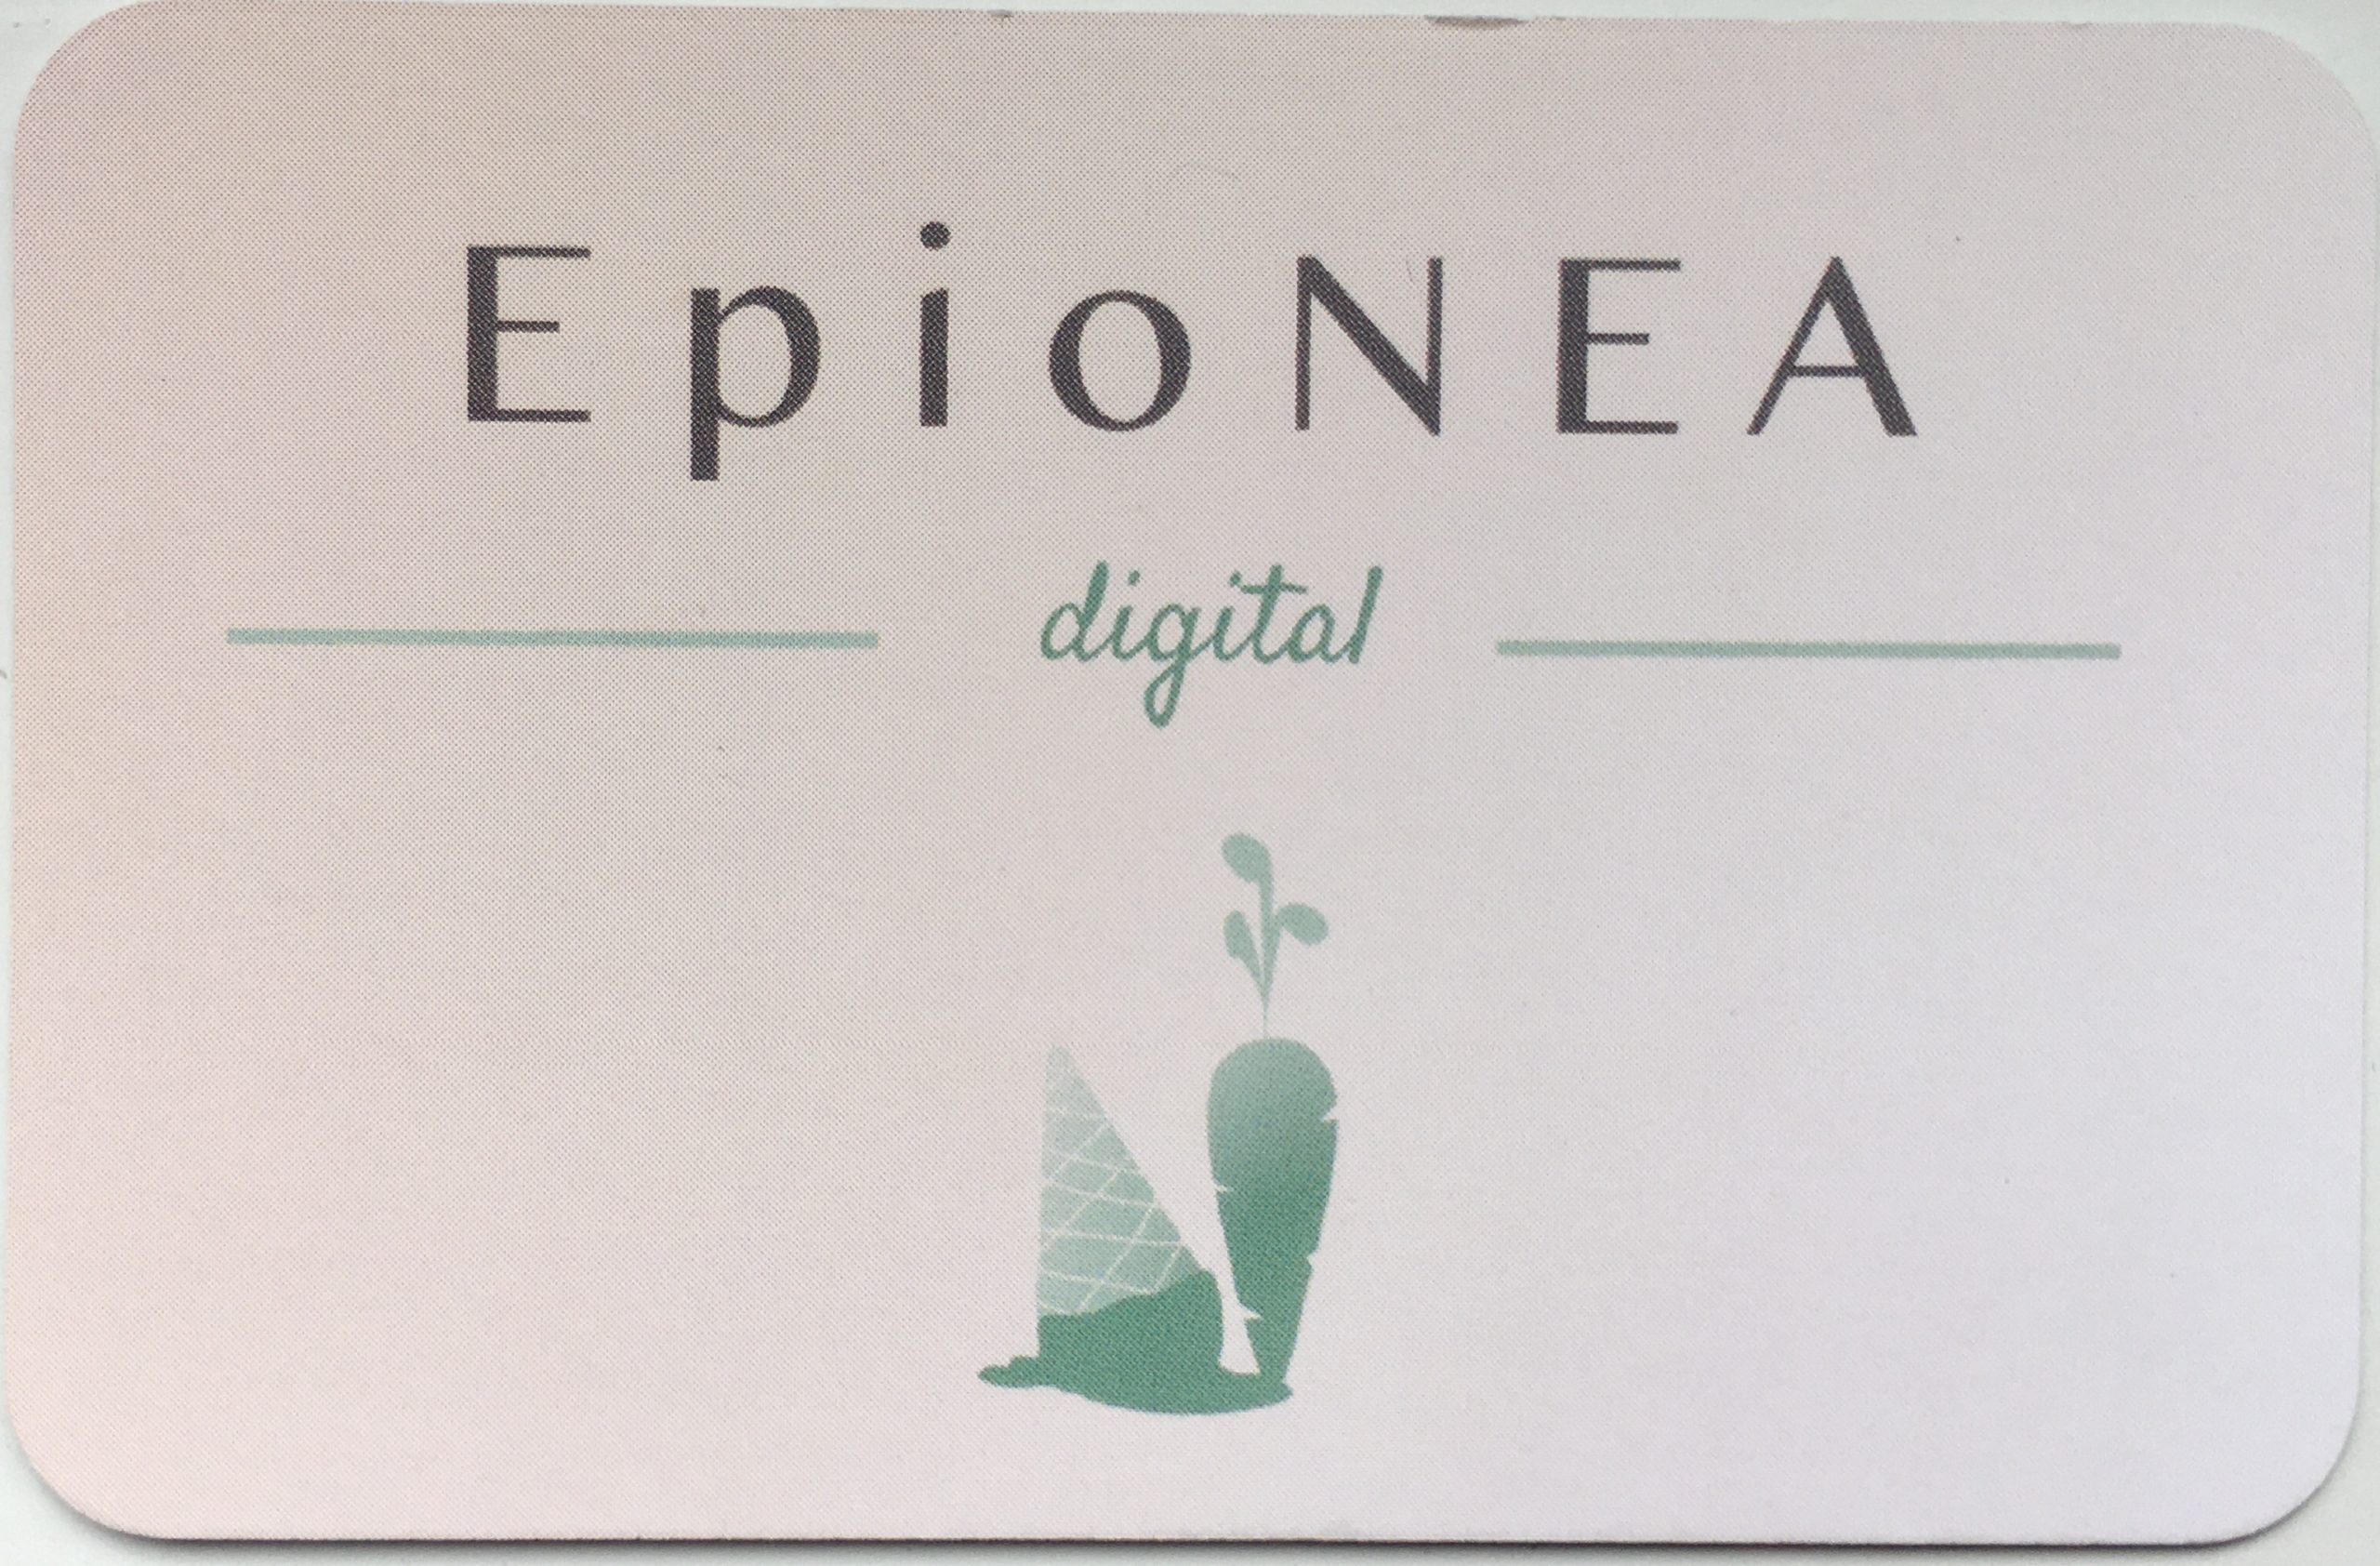 carte de visite Epionea 2